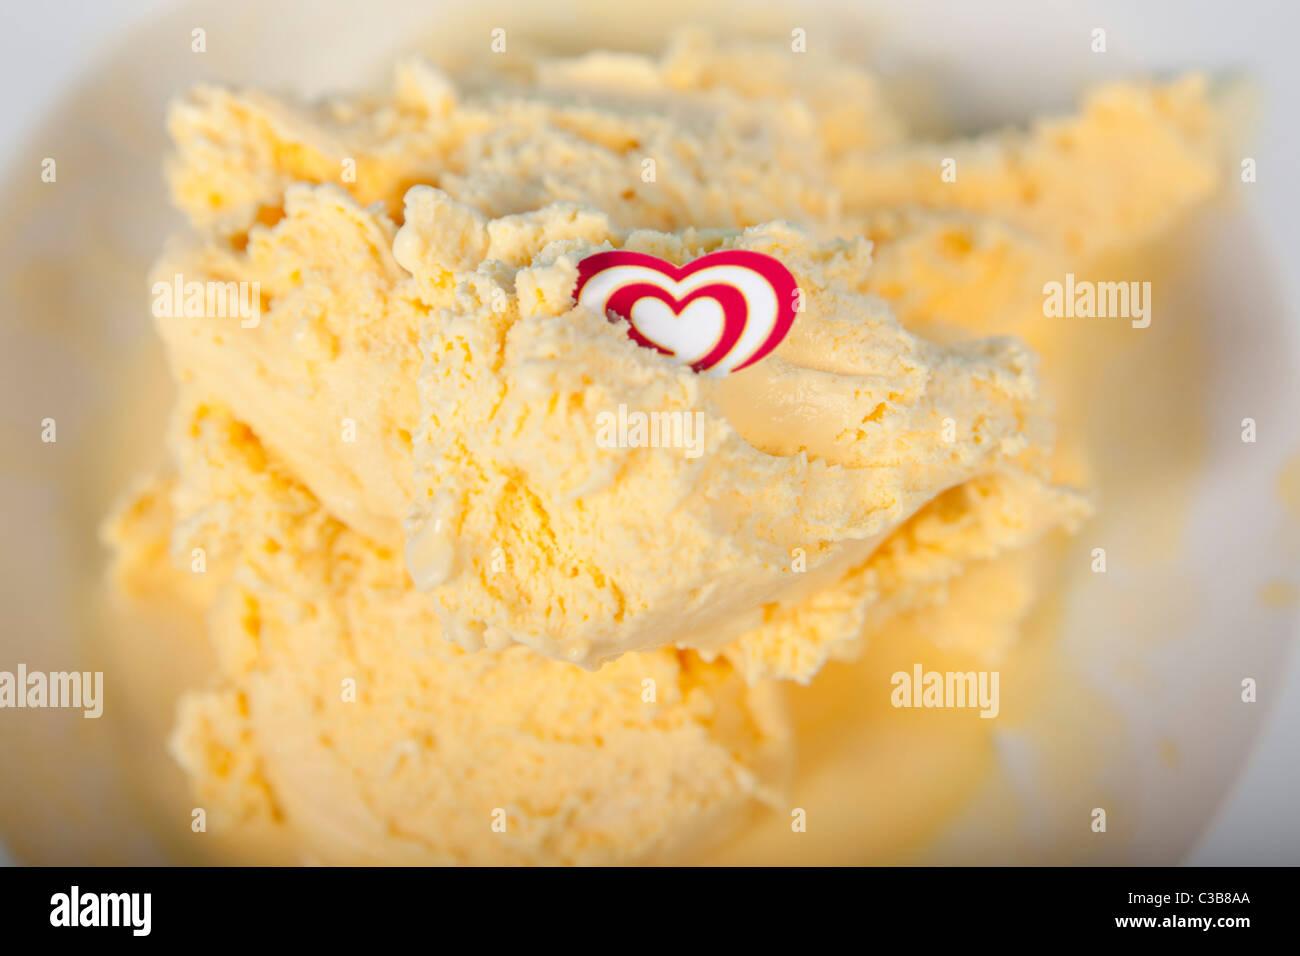 Illustrative image of Walls Cream of Cornish, soft scoop ice-cream. A Unilever brand. - Stock Image